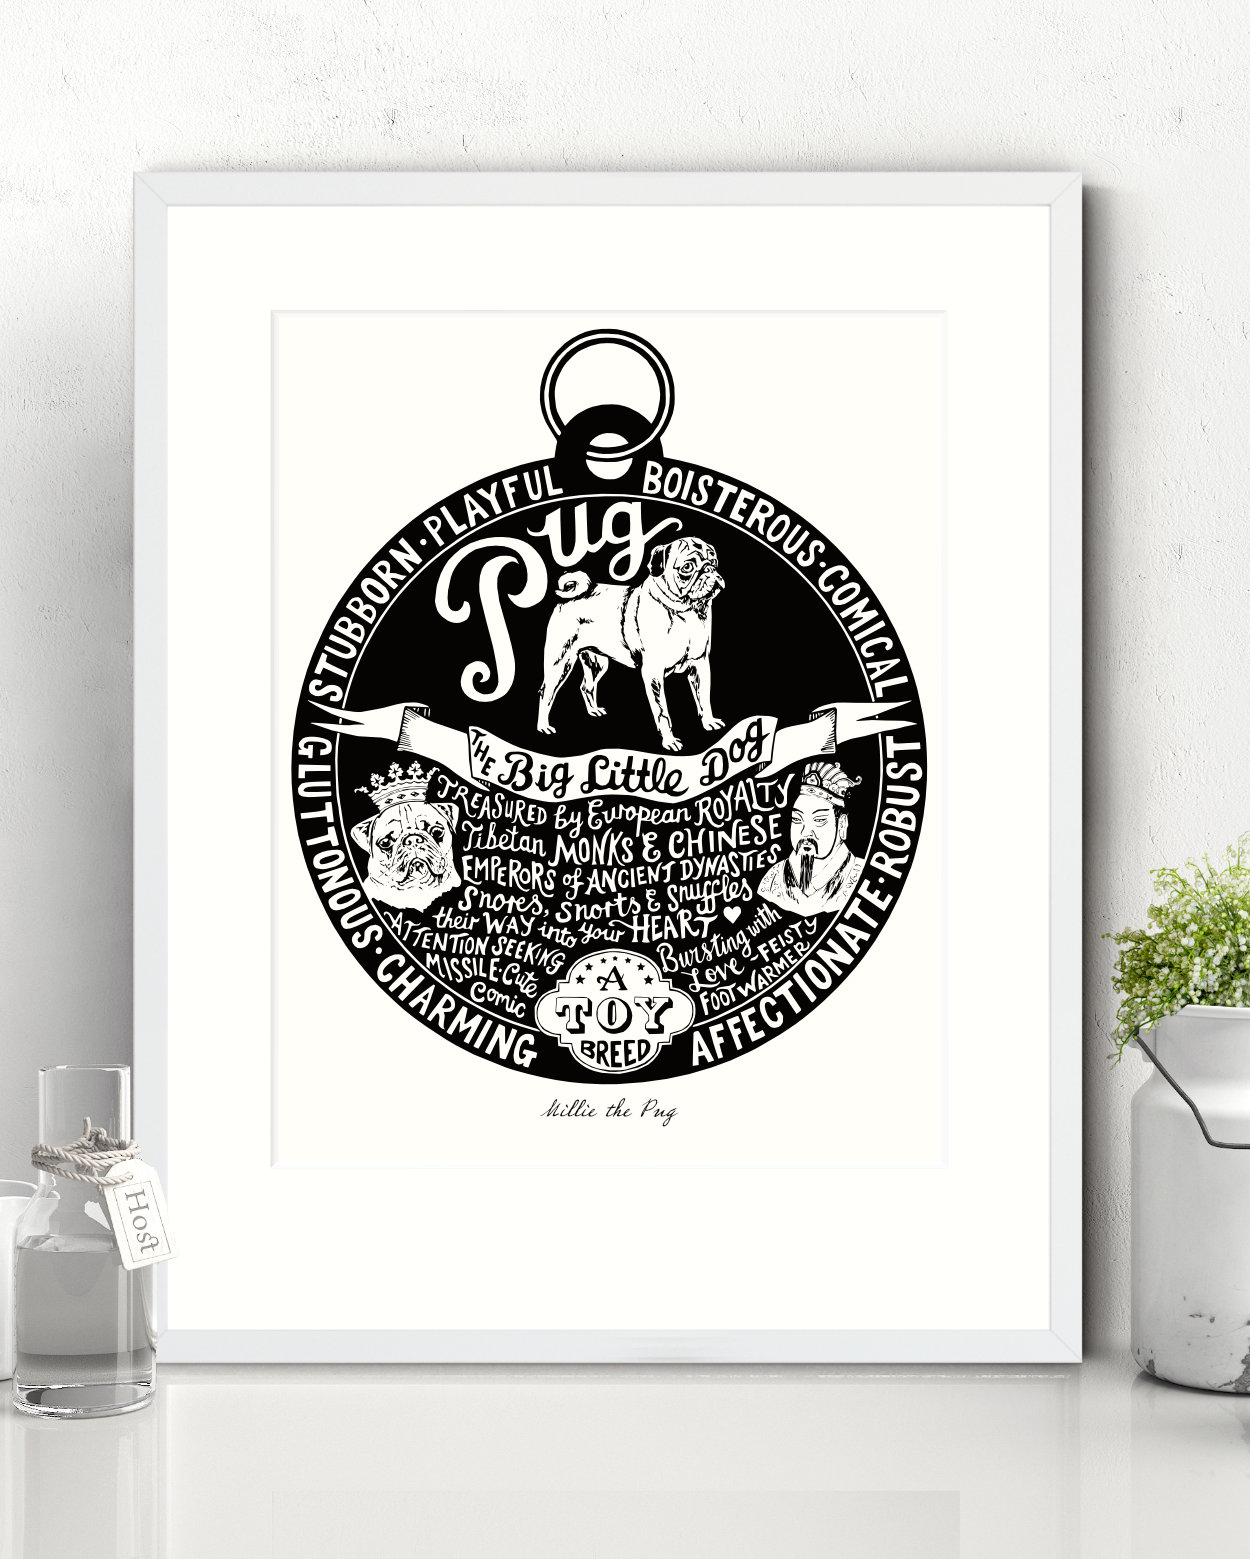 Pug Illustrated Art Print   The Enlightened Hound